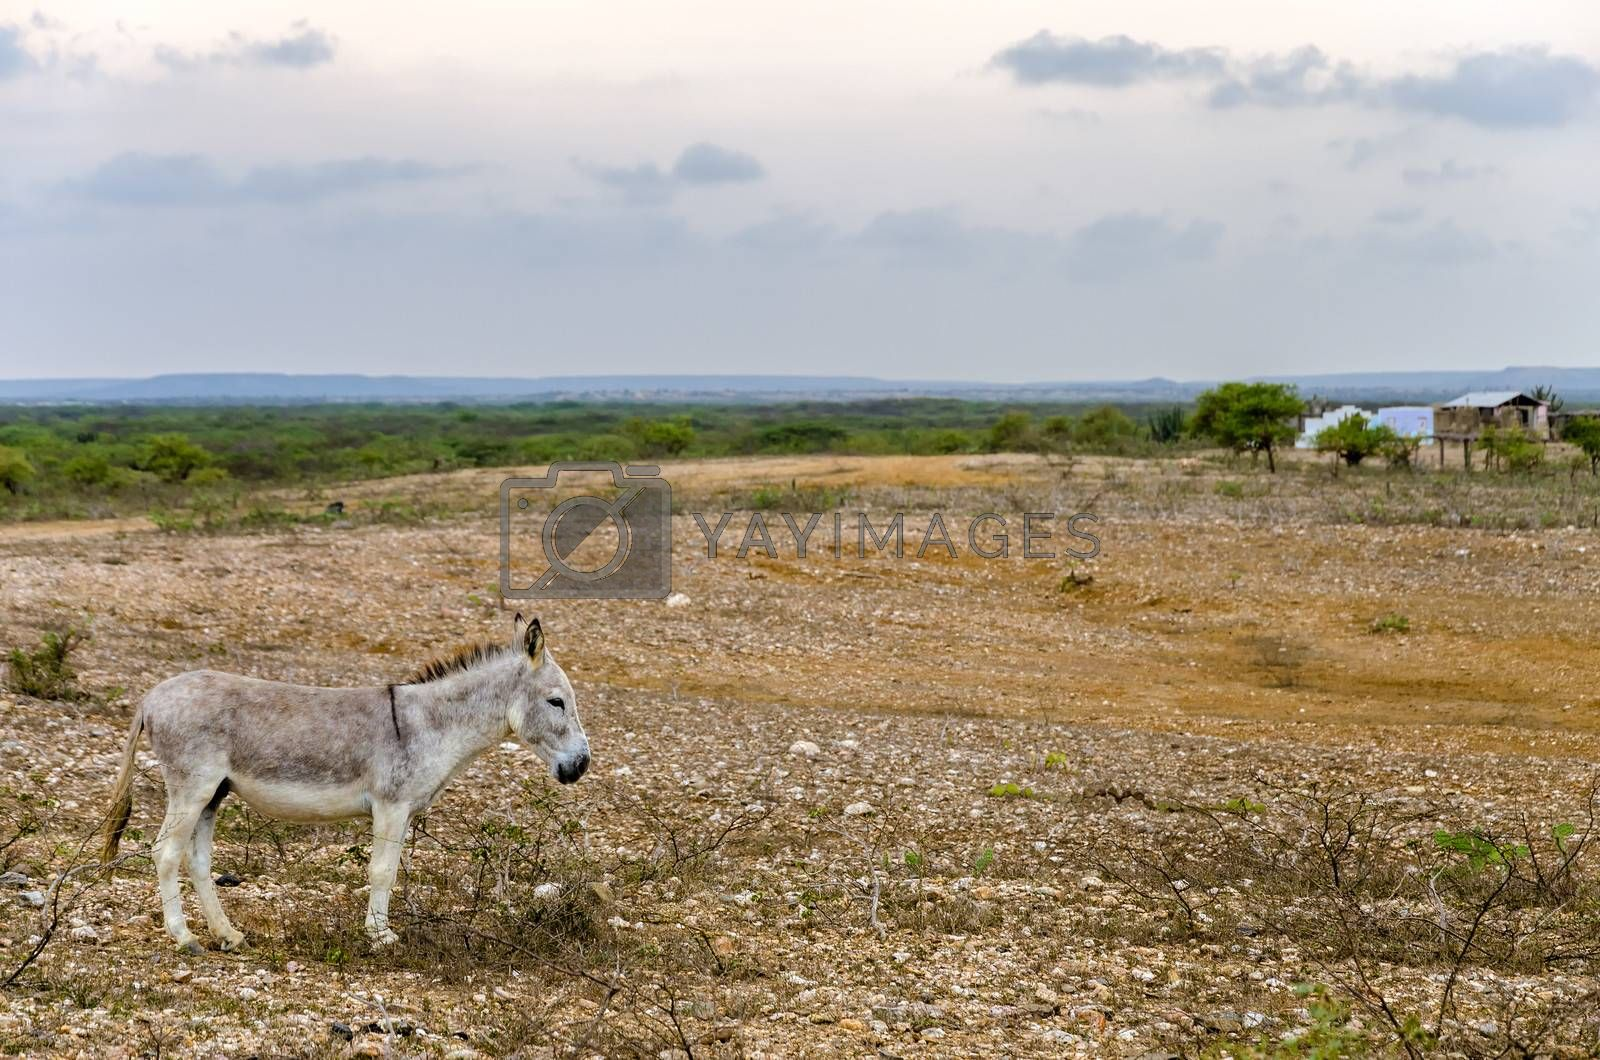 A grey donkey in a dry barren landscape